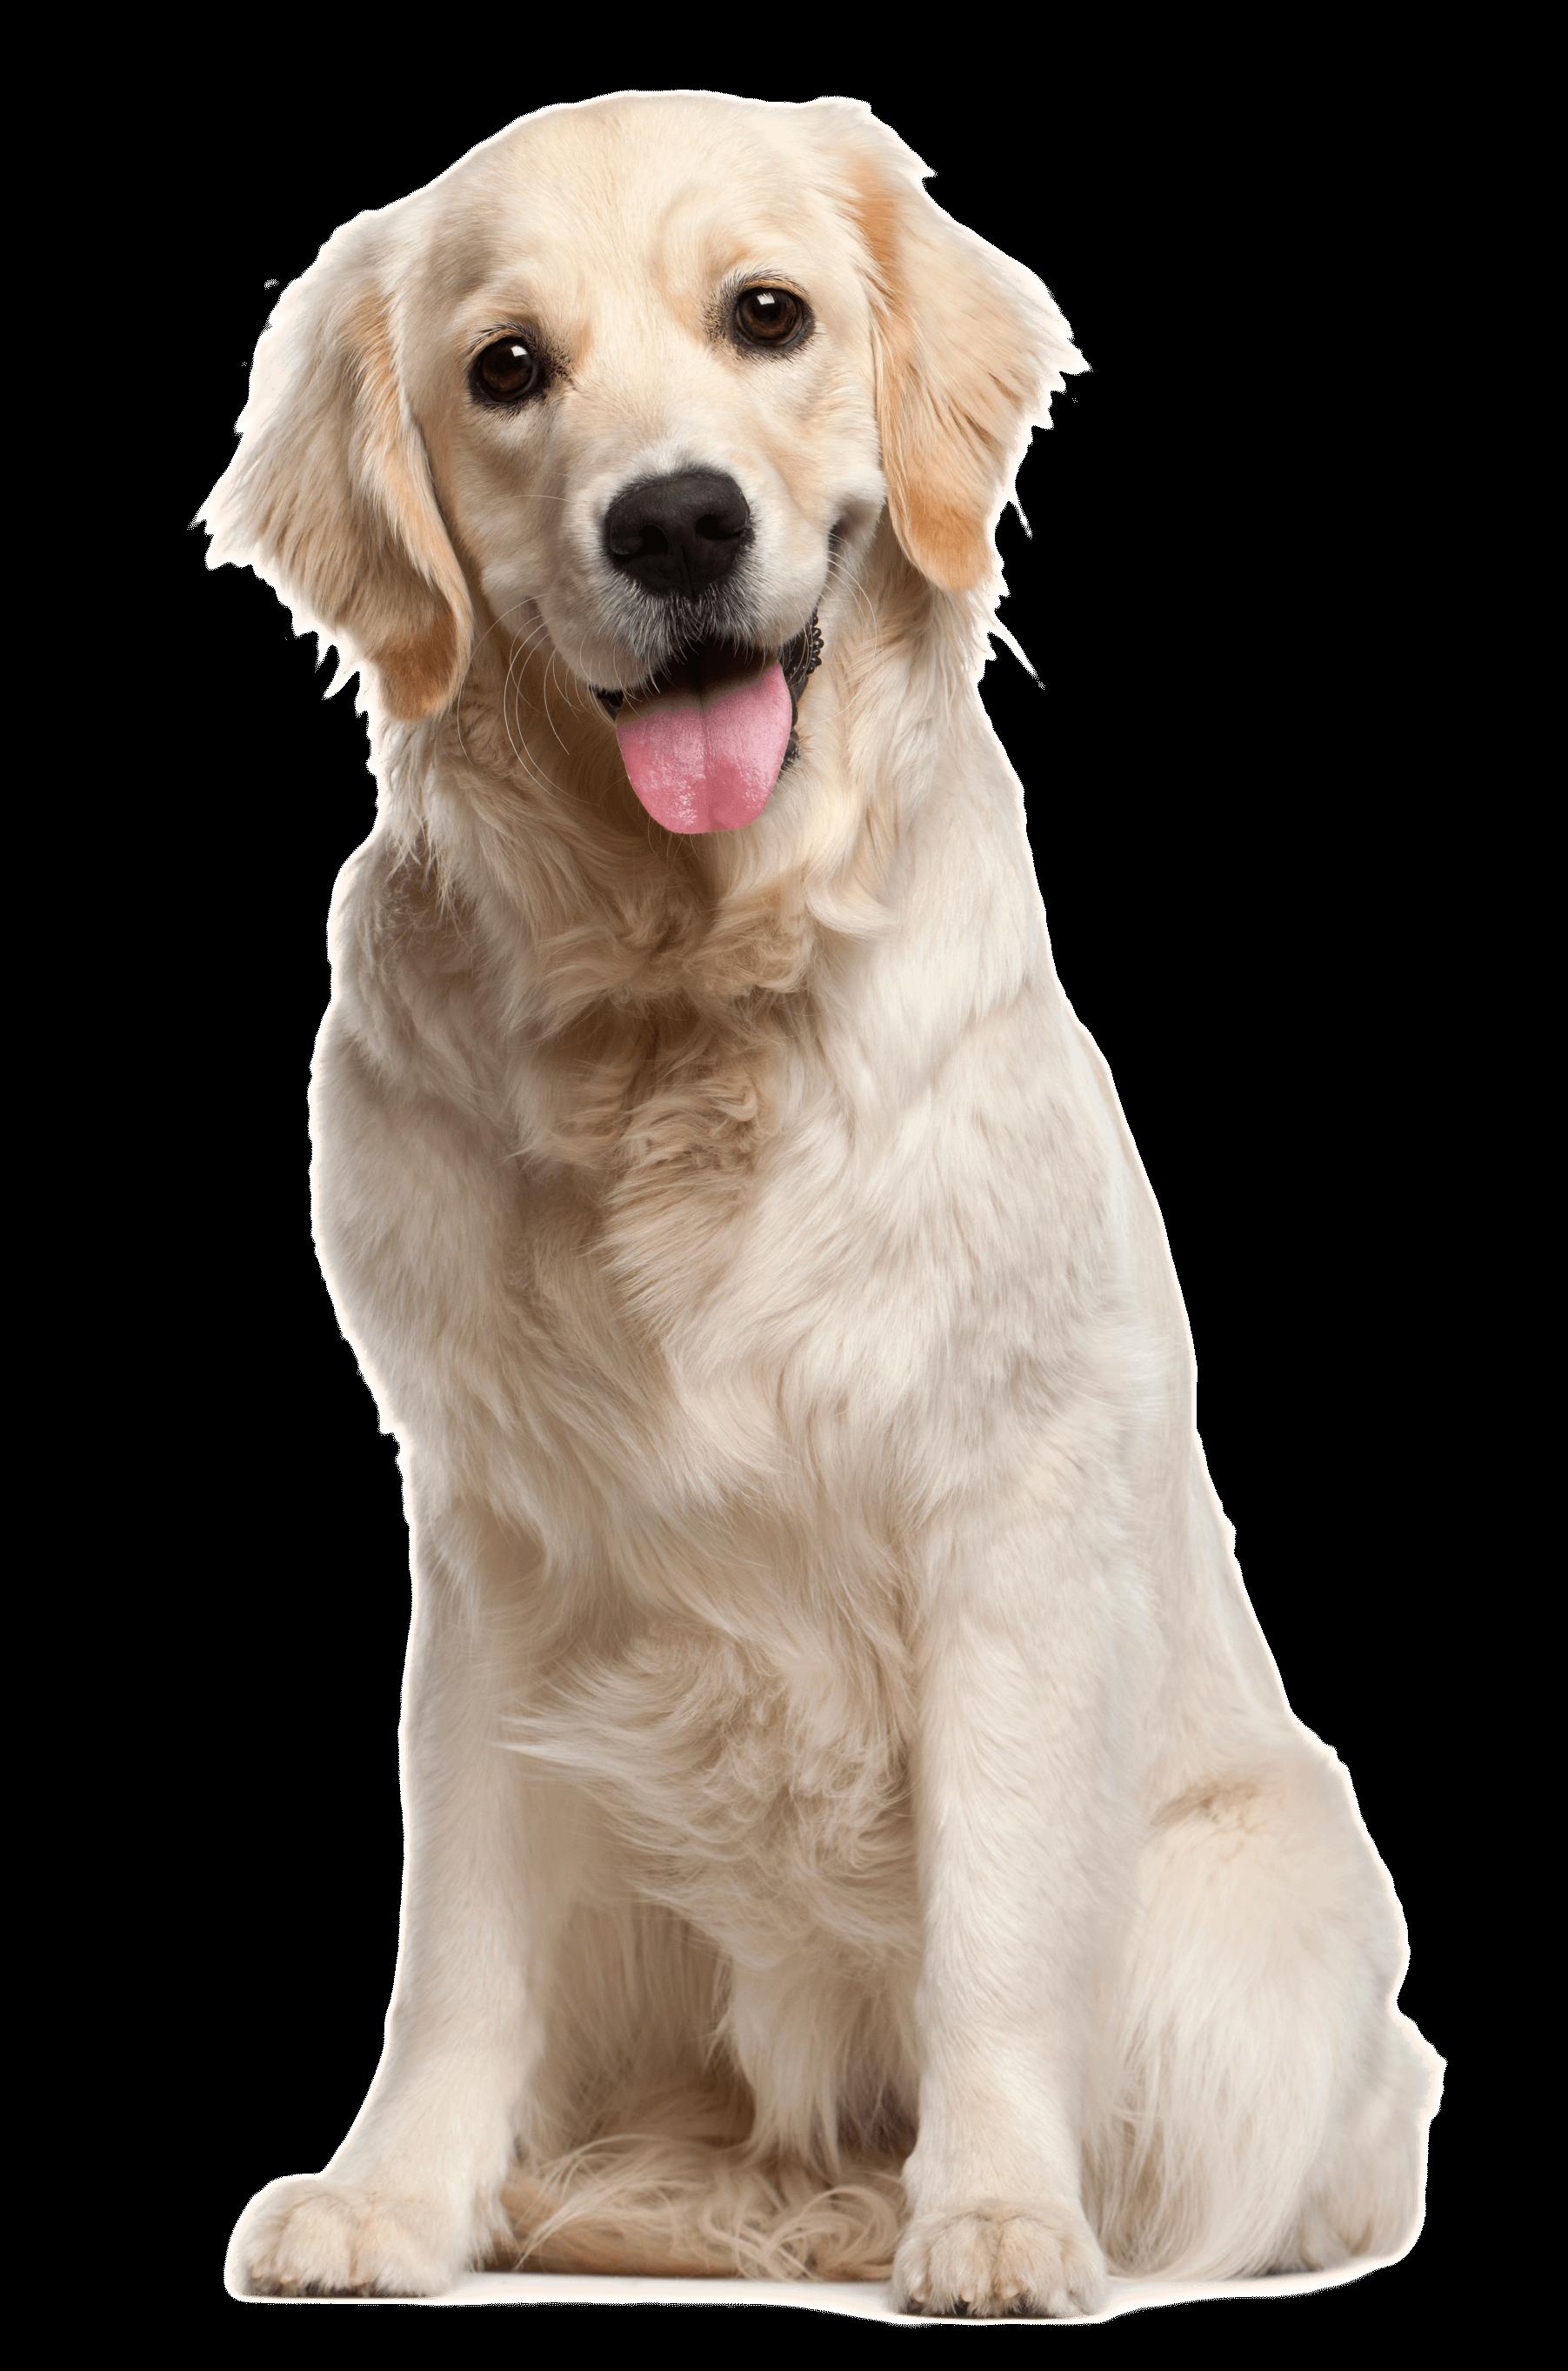 Dog PNG - 21969